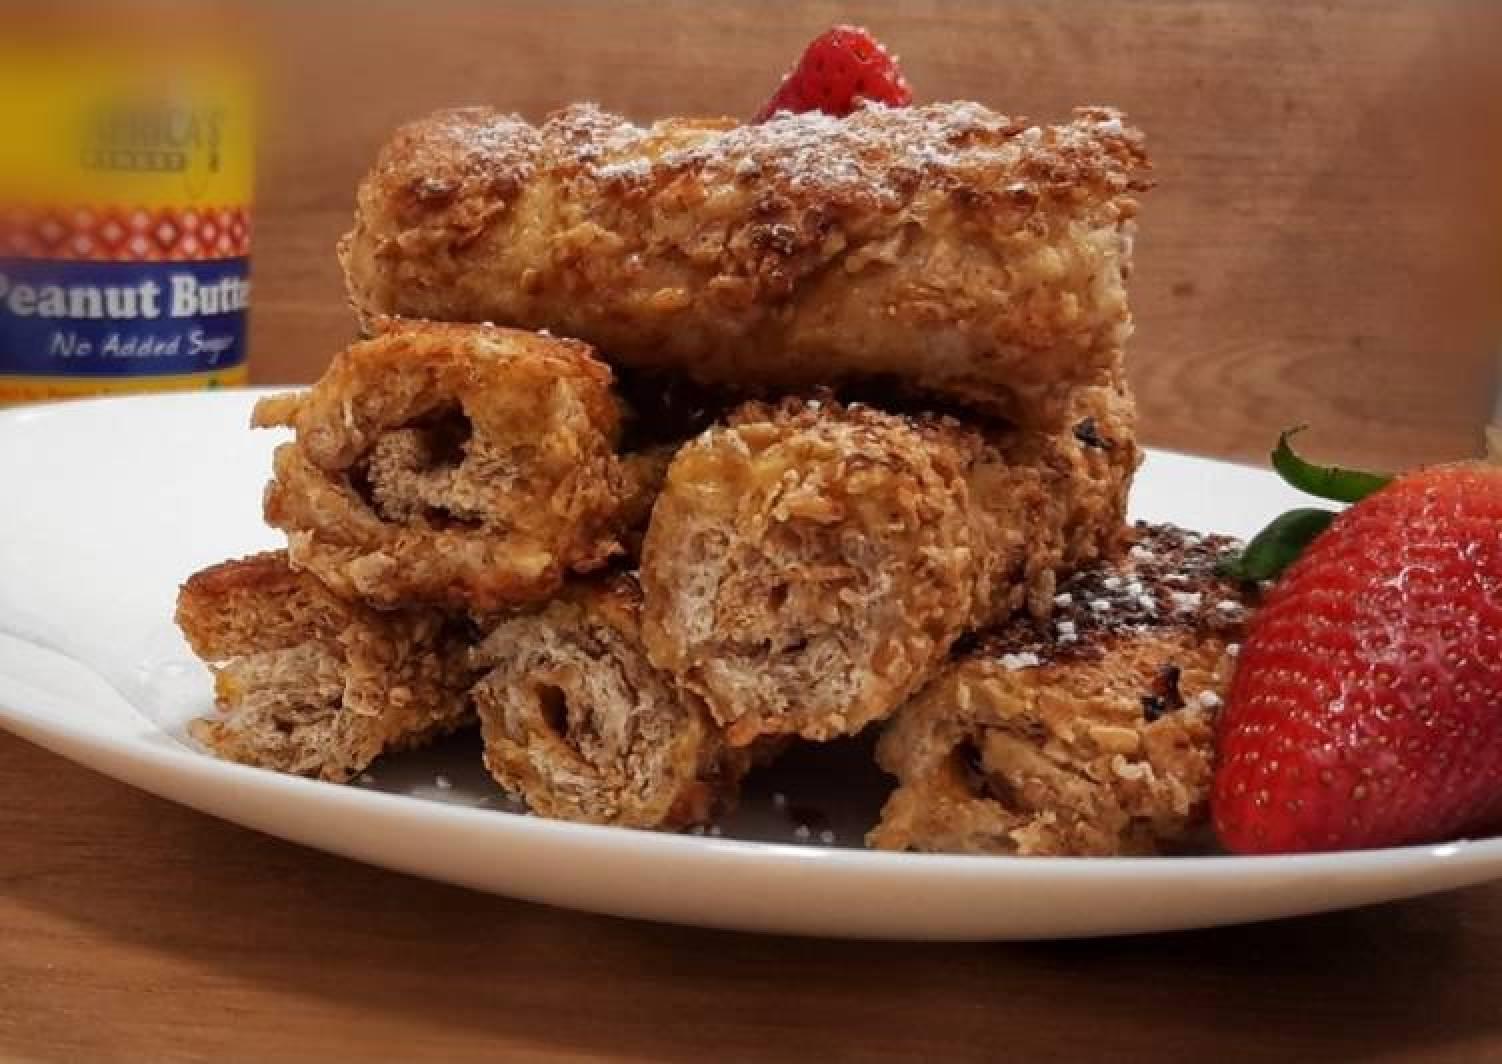 Peanut butter and jam bread rolls